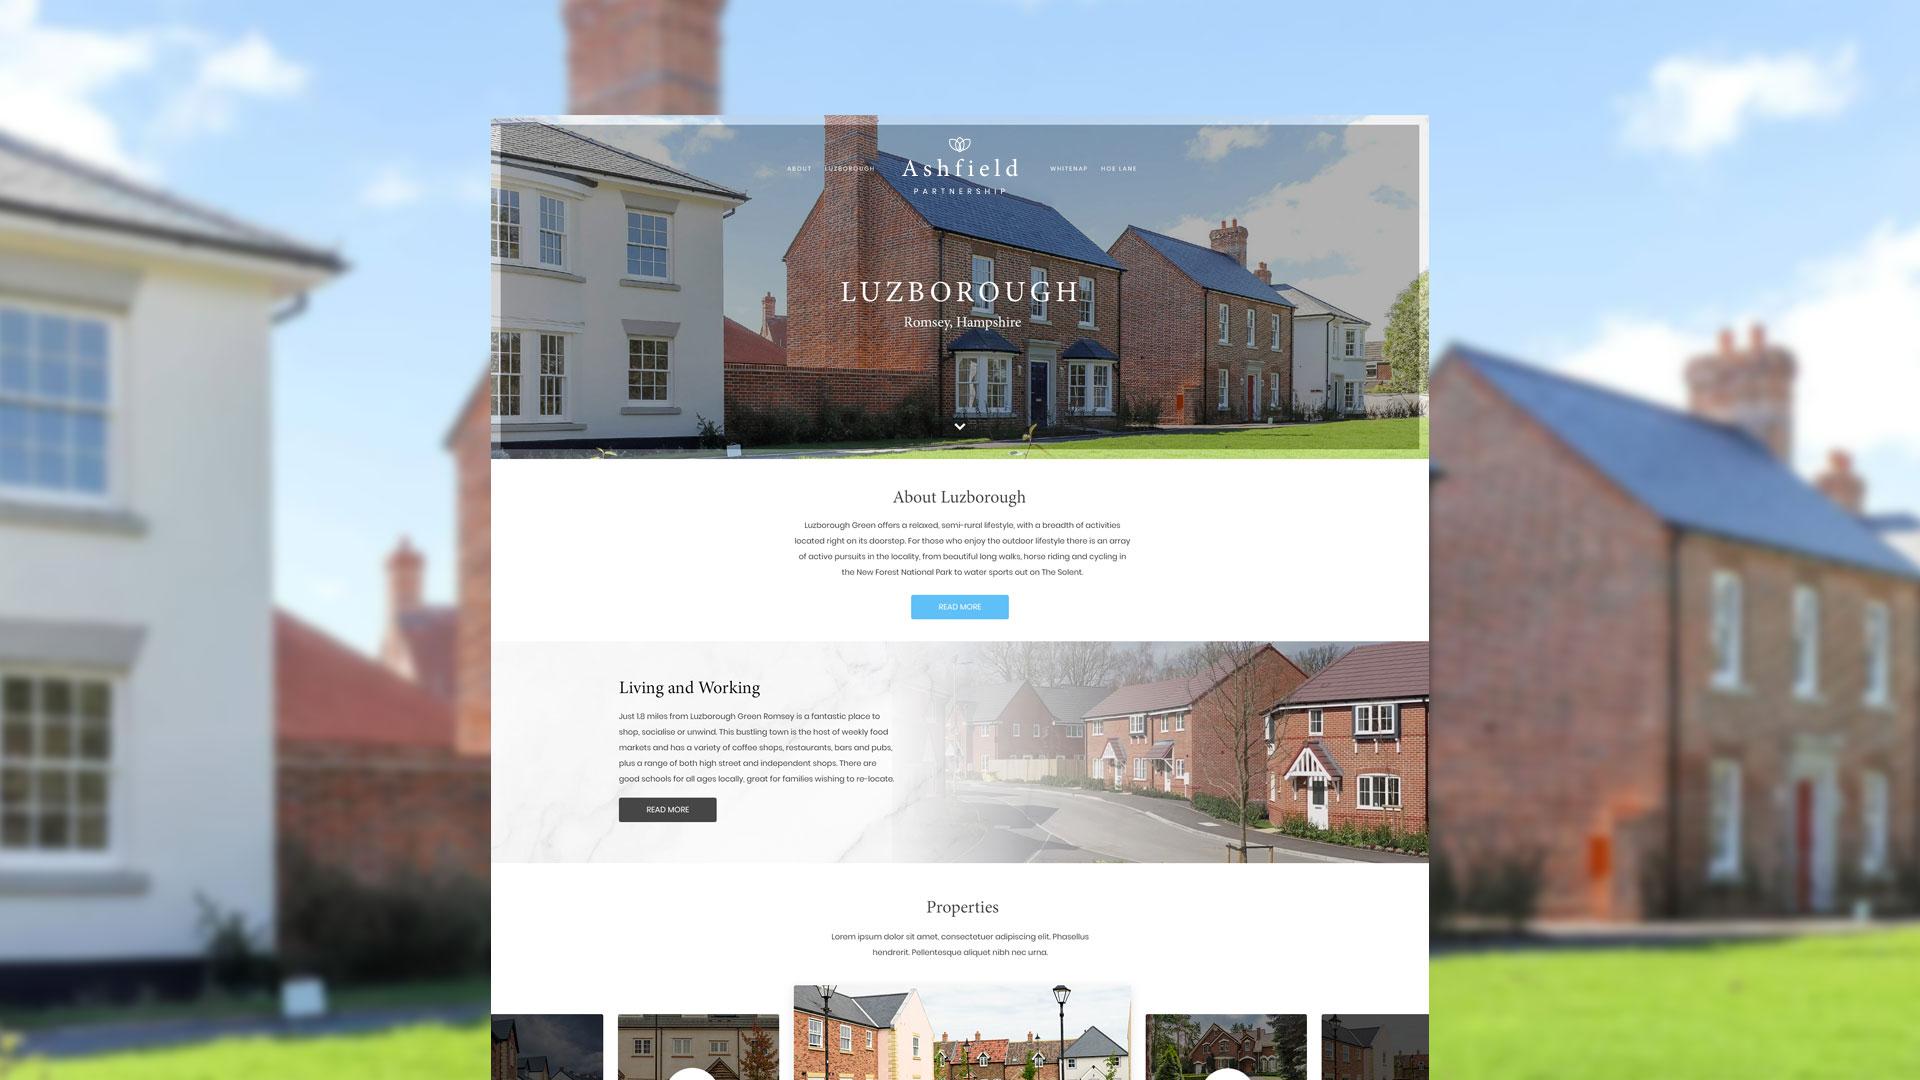 The Ashfield Partnership - Website Mockup